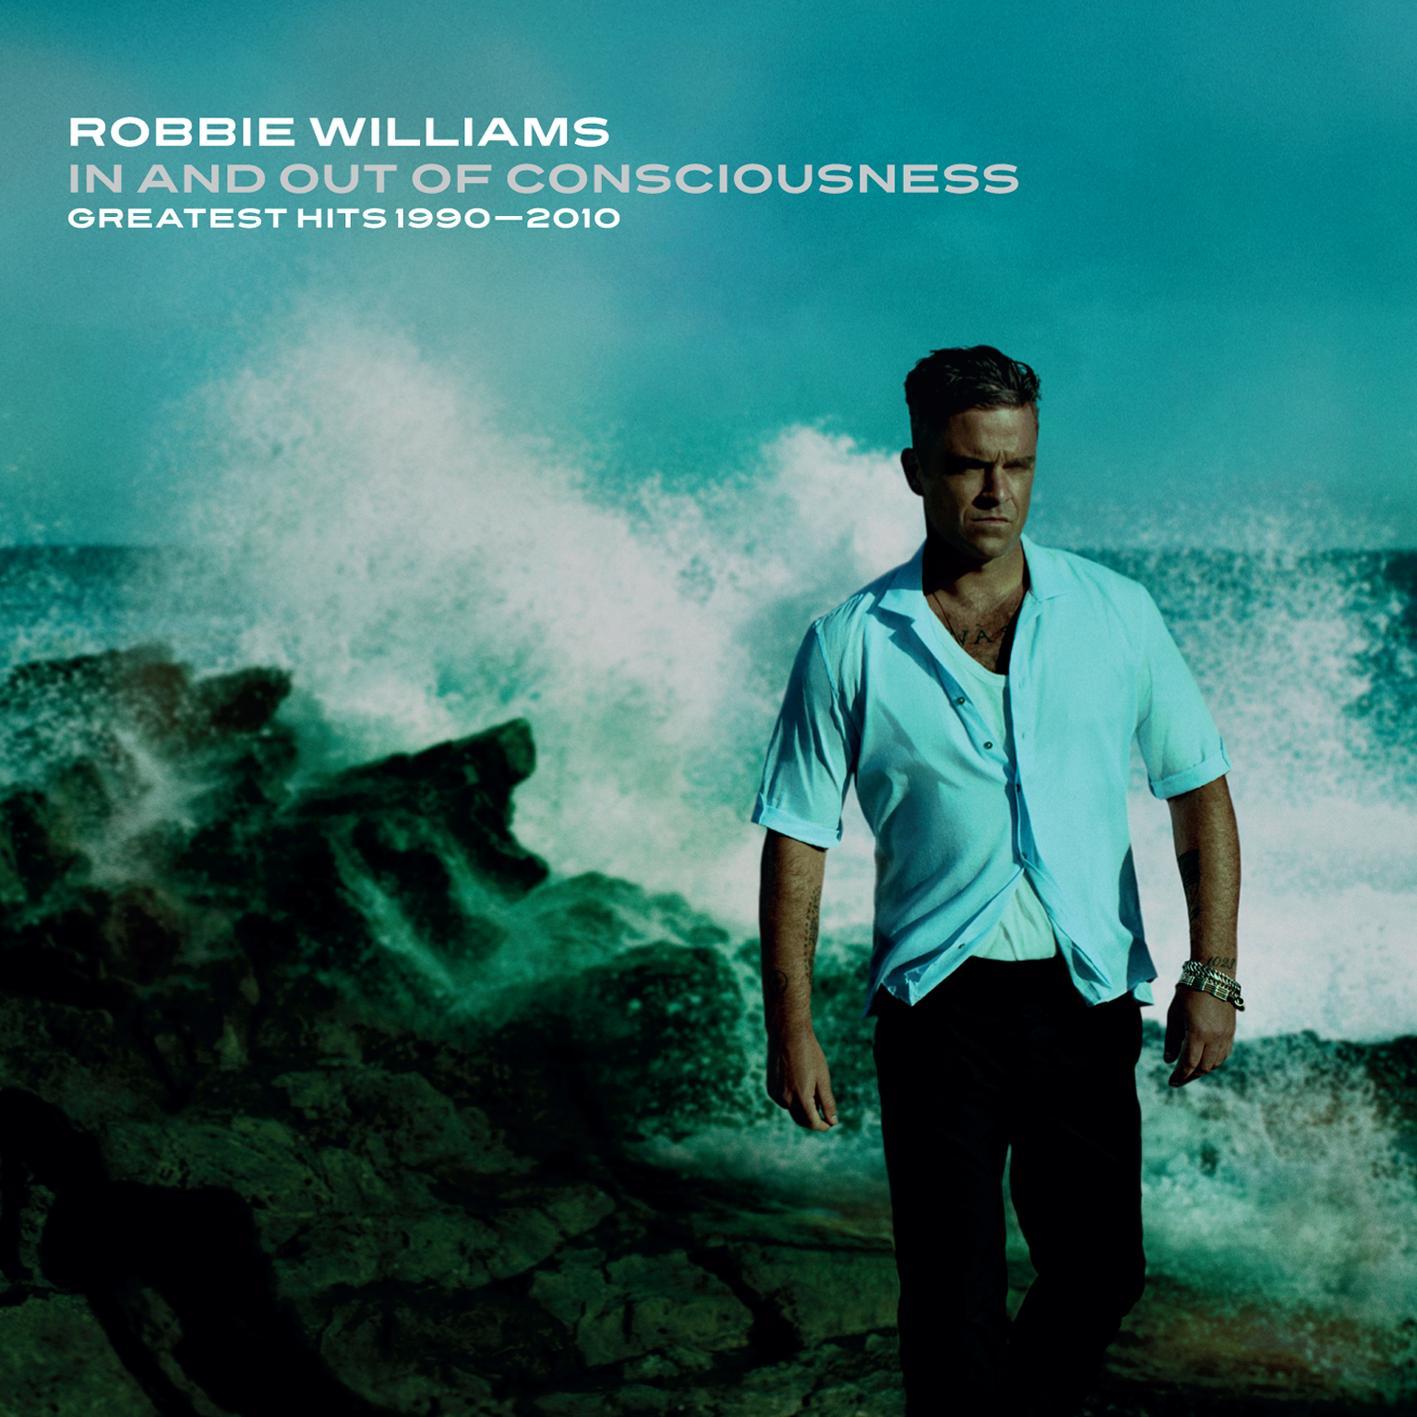 http://2.bp.blogspot.com/_dl8QaFOi1rw/TTOwMCzzyFI/AAAAAAAABHI/pfGXl3mPCeQ/s1600/Robbie+Williams+cover.jpg